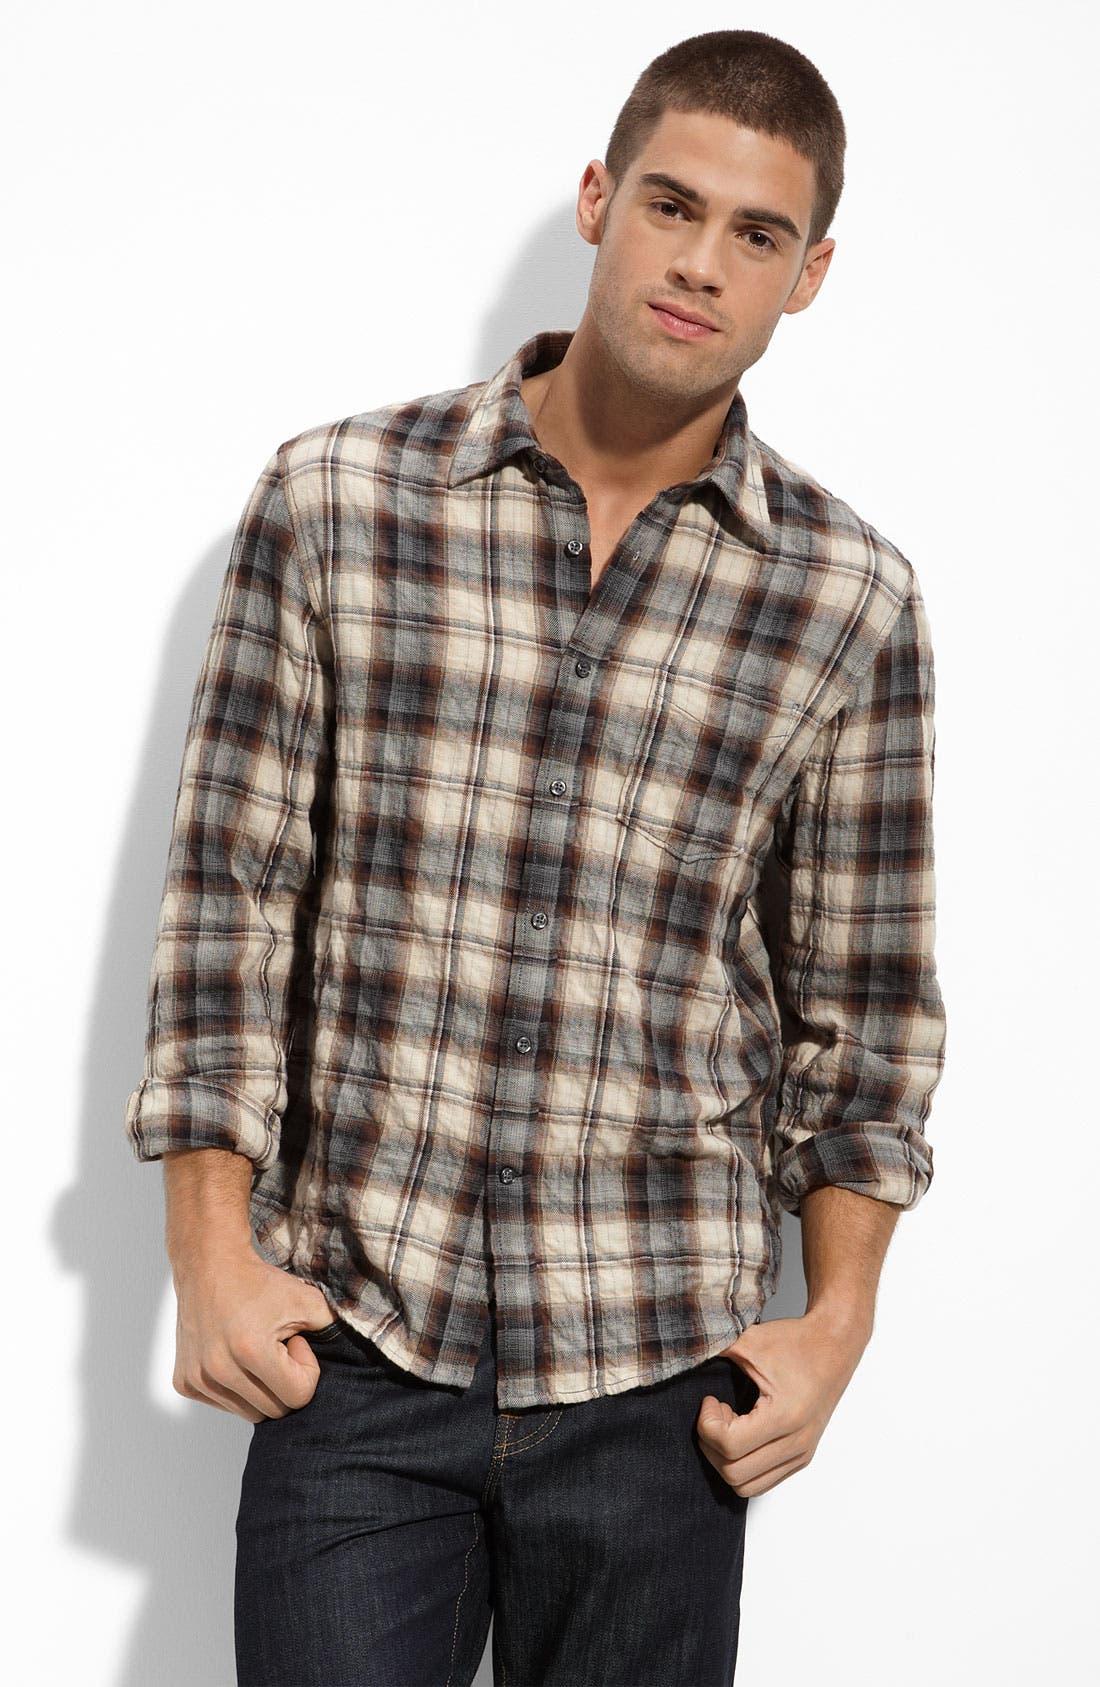 J. Campbell Crinkled Plaid Shirt,                         Main,                         color, Brown Plaid